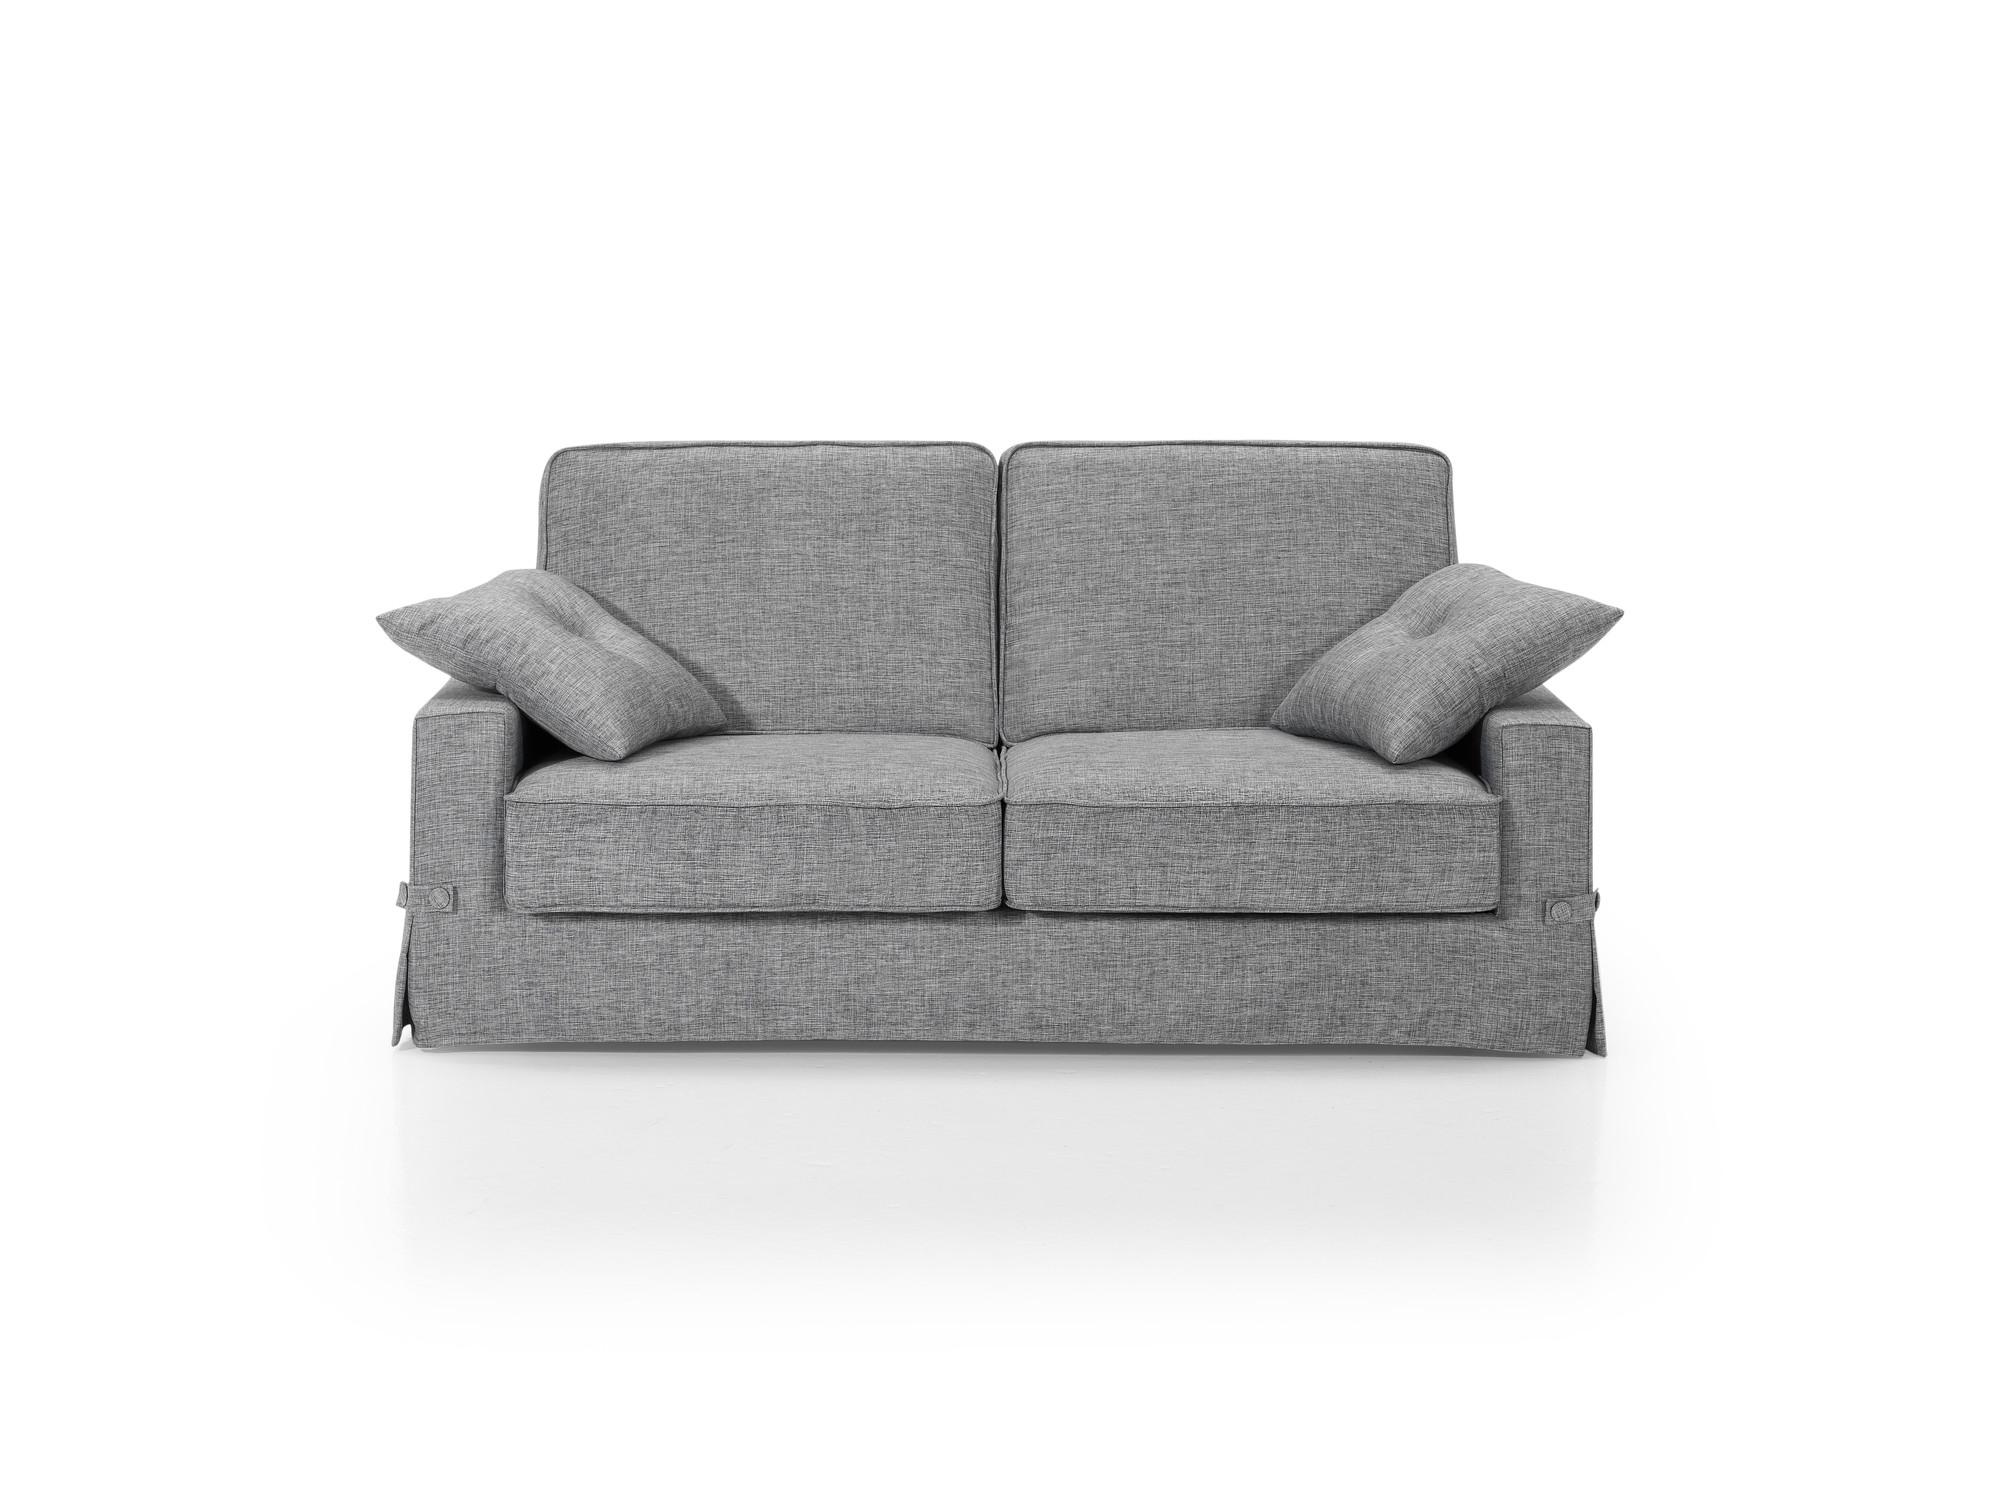 Sofa Cama Online Dwdk Prar sofas Cama Baratos Online La Mesa De Centro